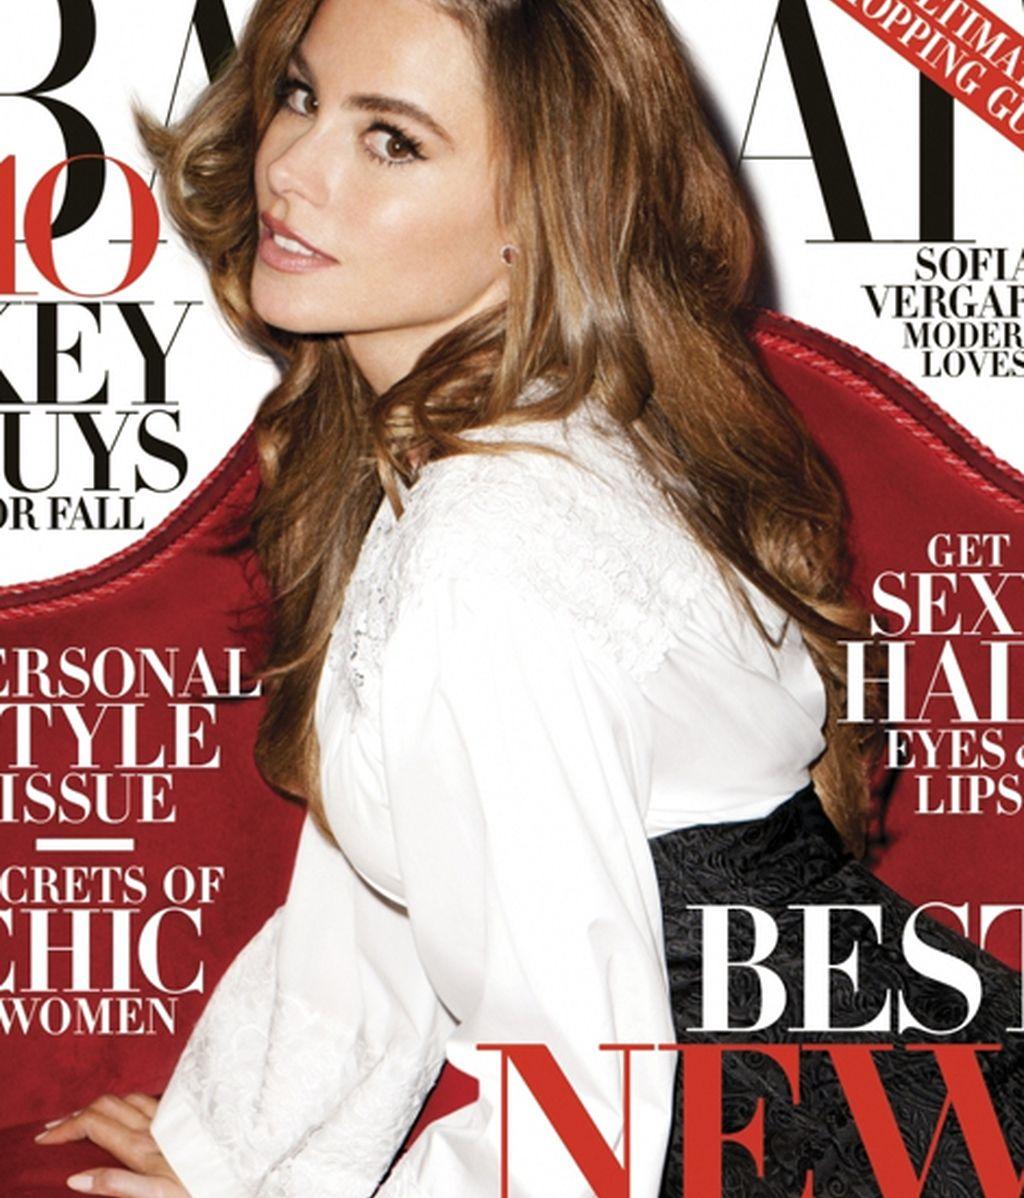 Sofía Vergara, portada de Harper's Bazaar